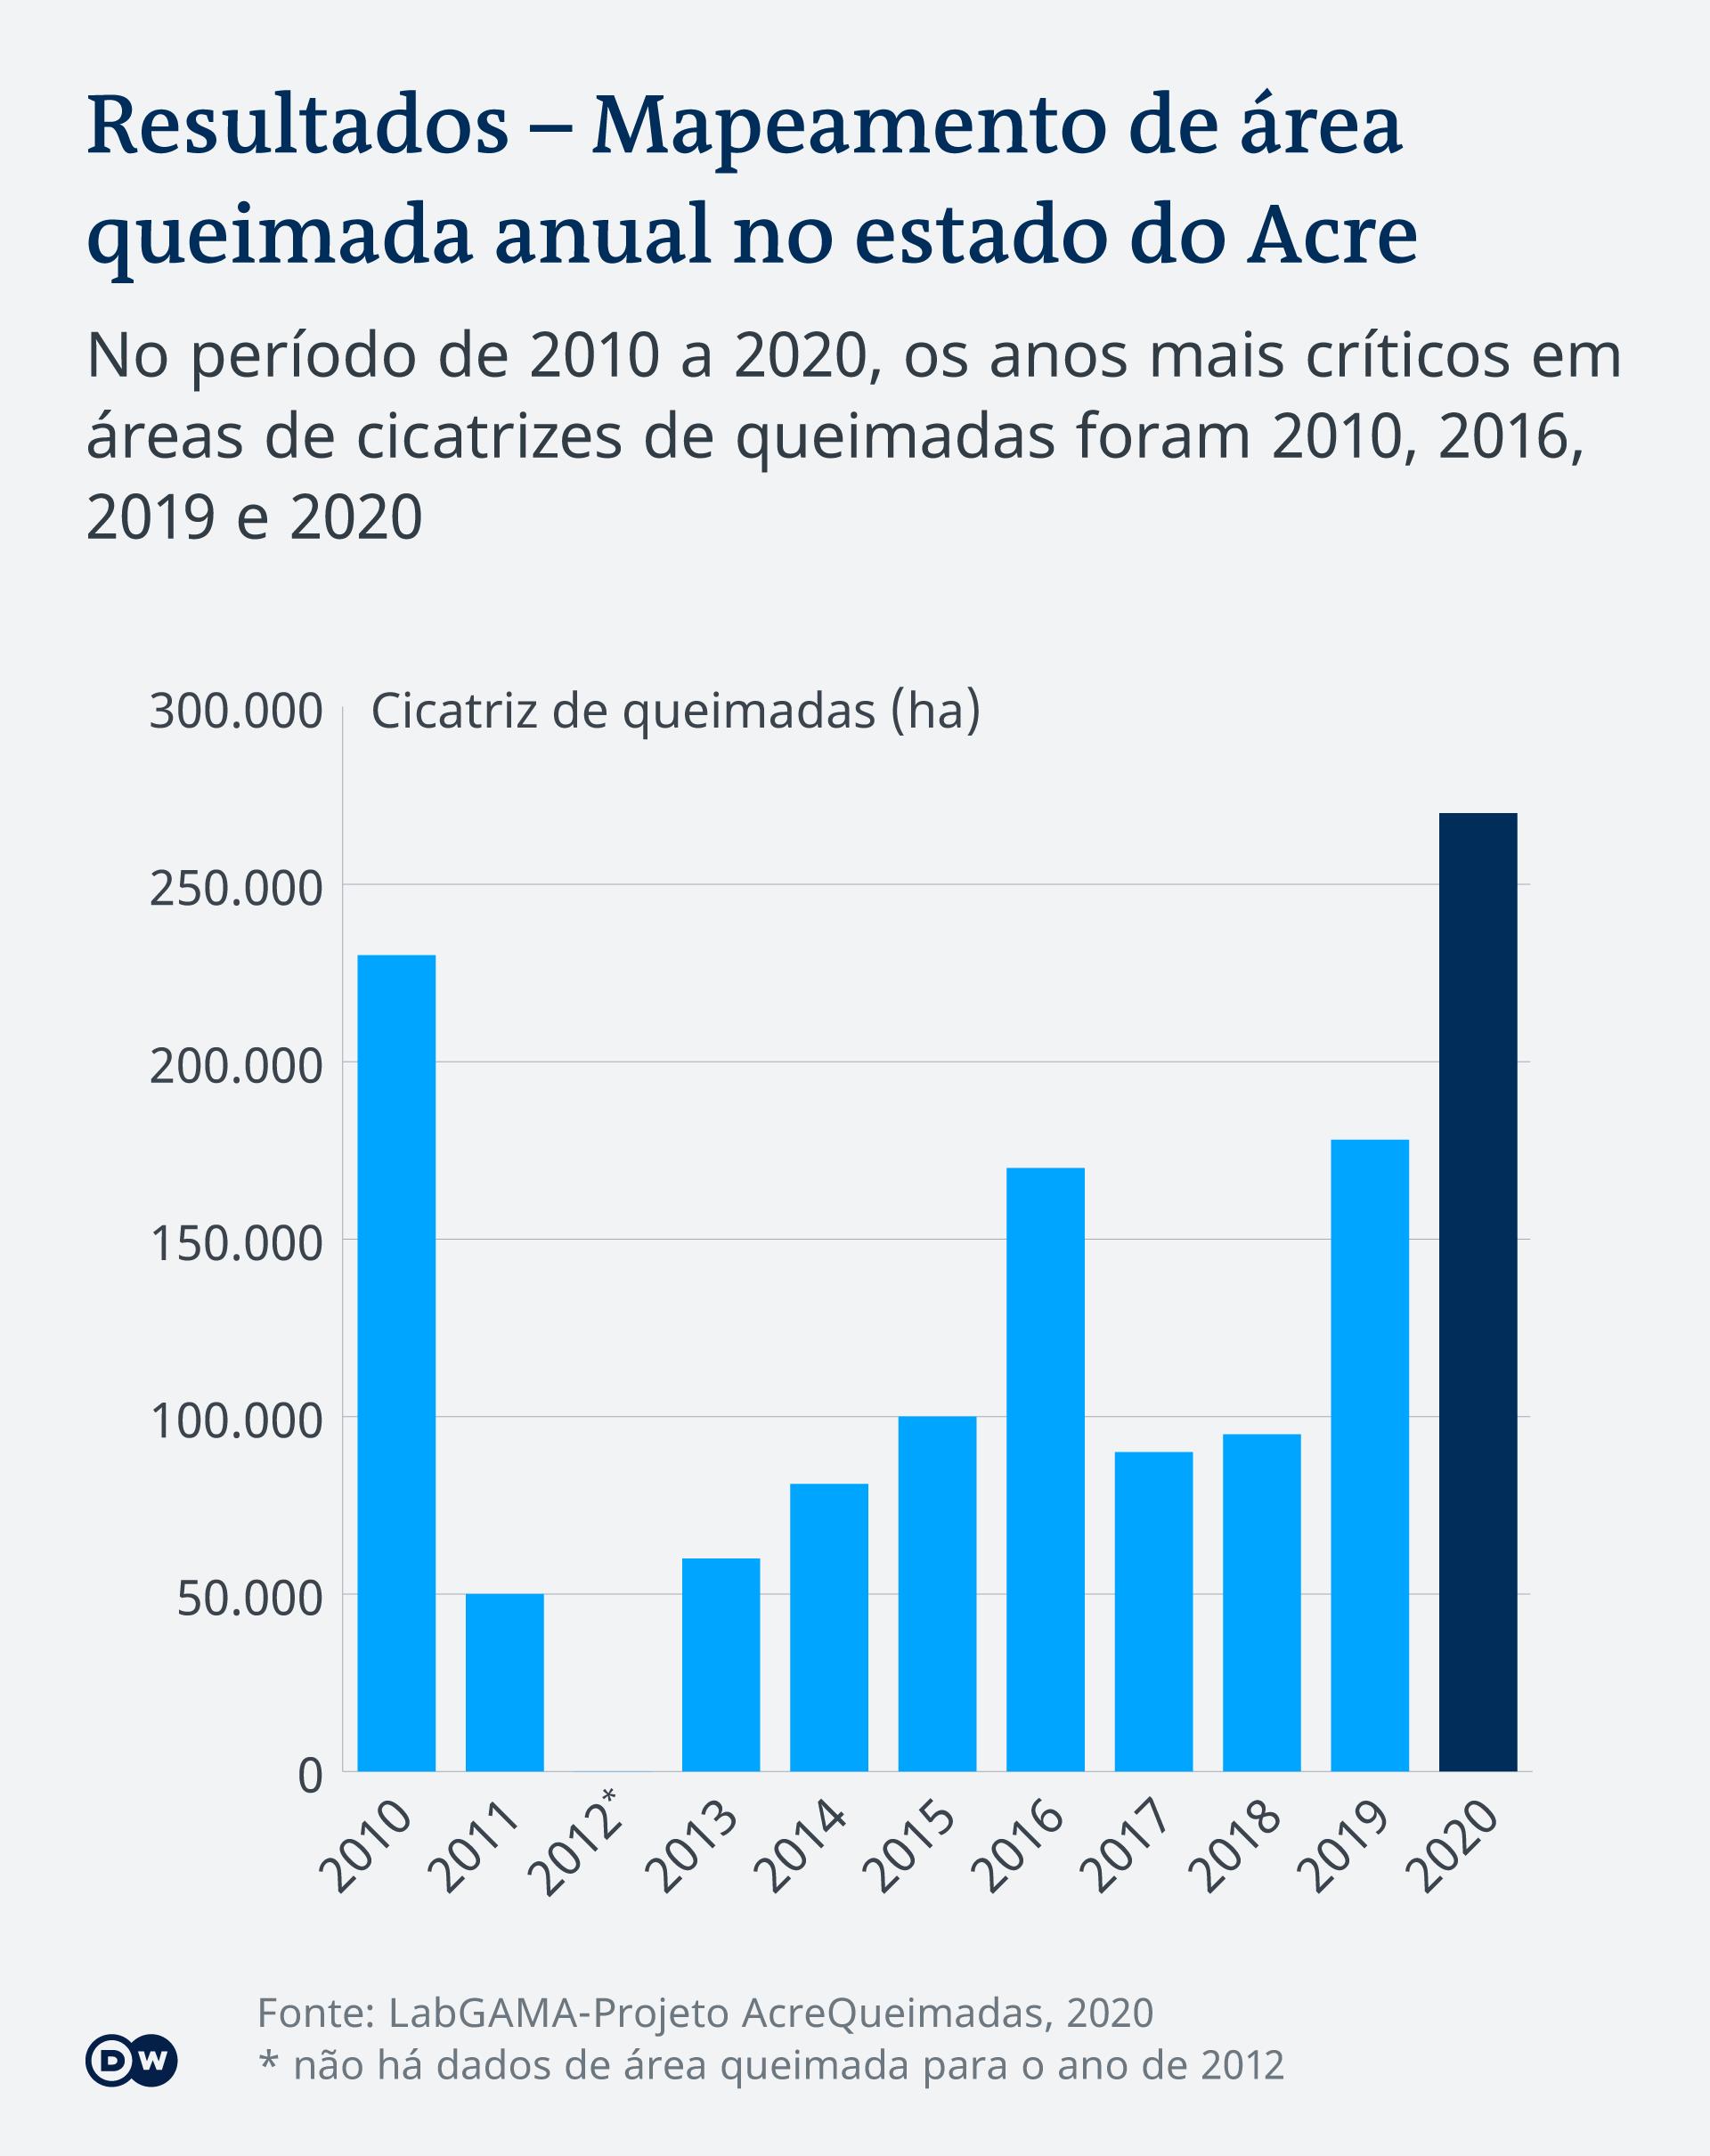 Infografik Abholzung durch Feuer in Acre Brasilien PT-BR